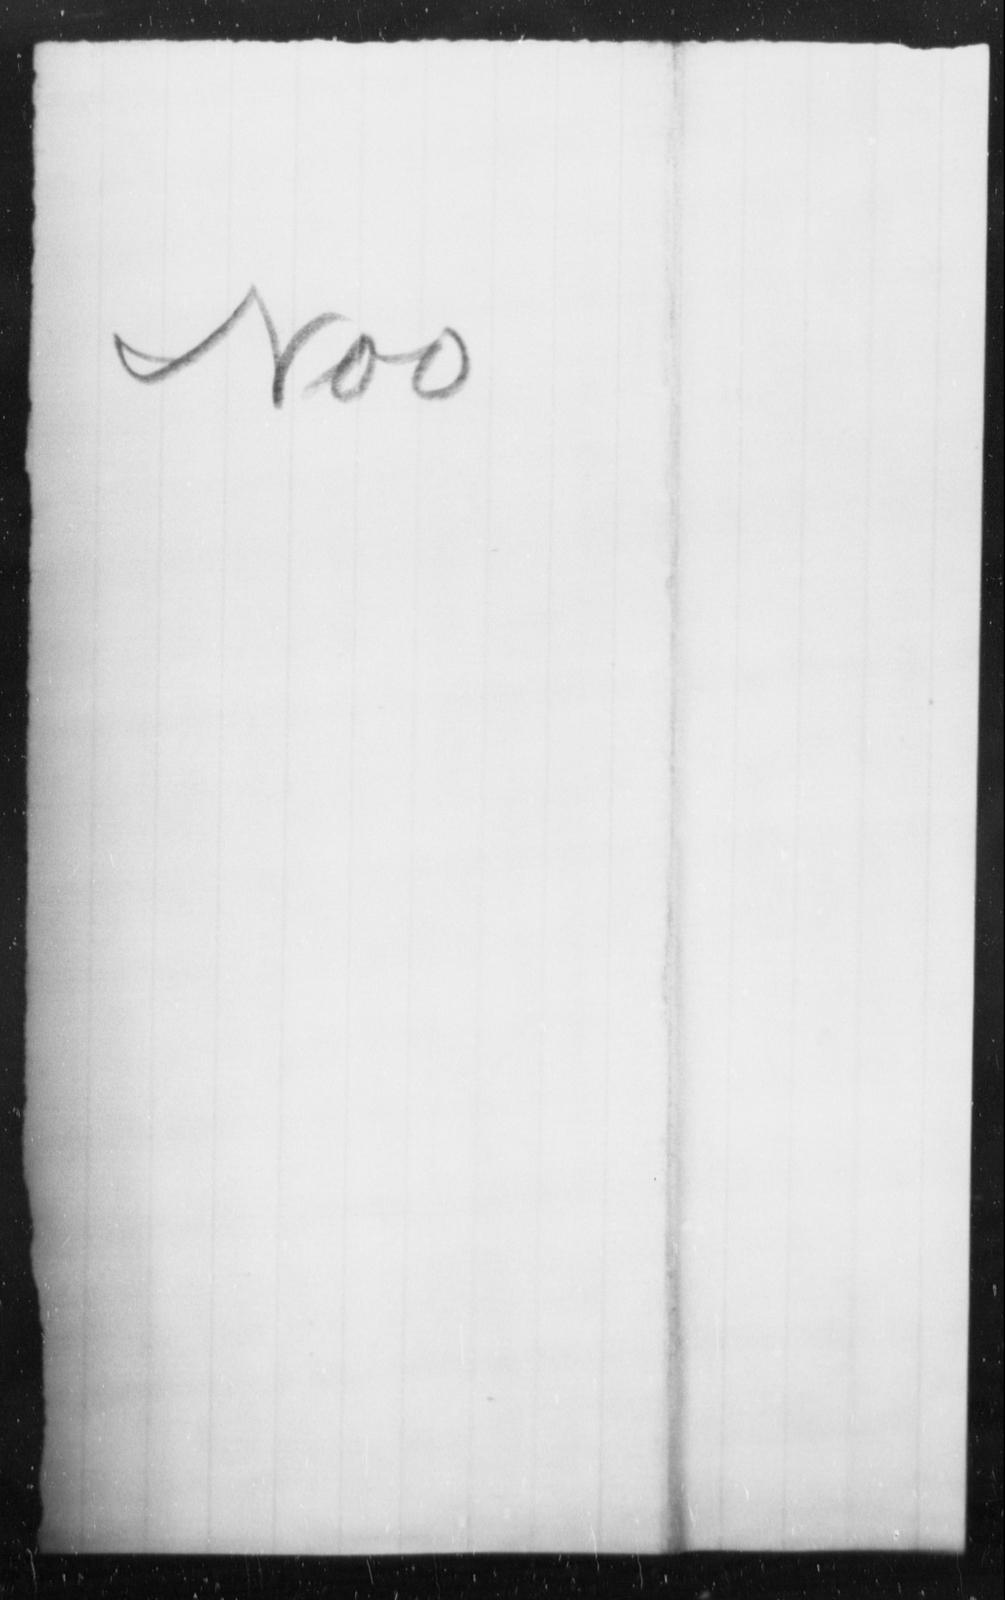 Noo, [Blank] - State: [Blank] - Year: [Blank]